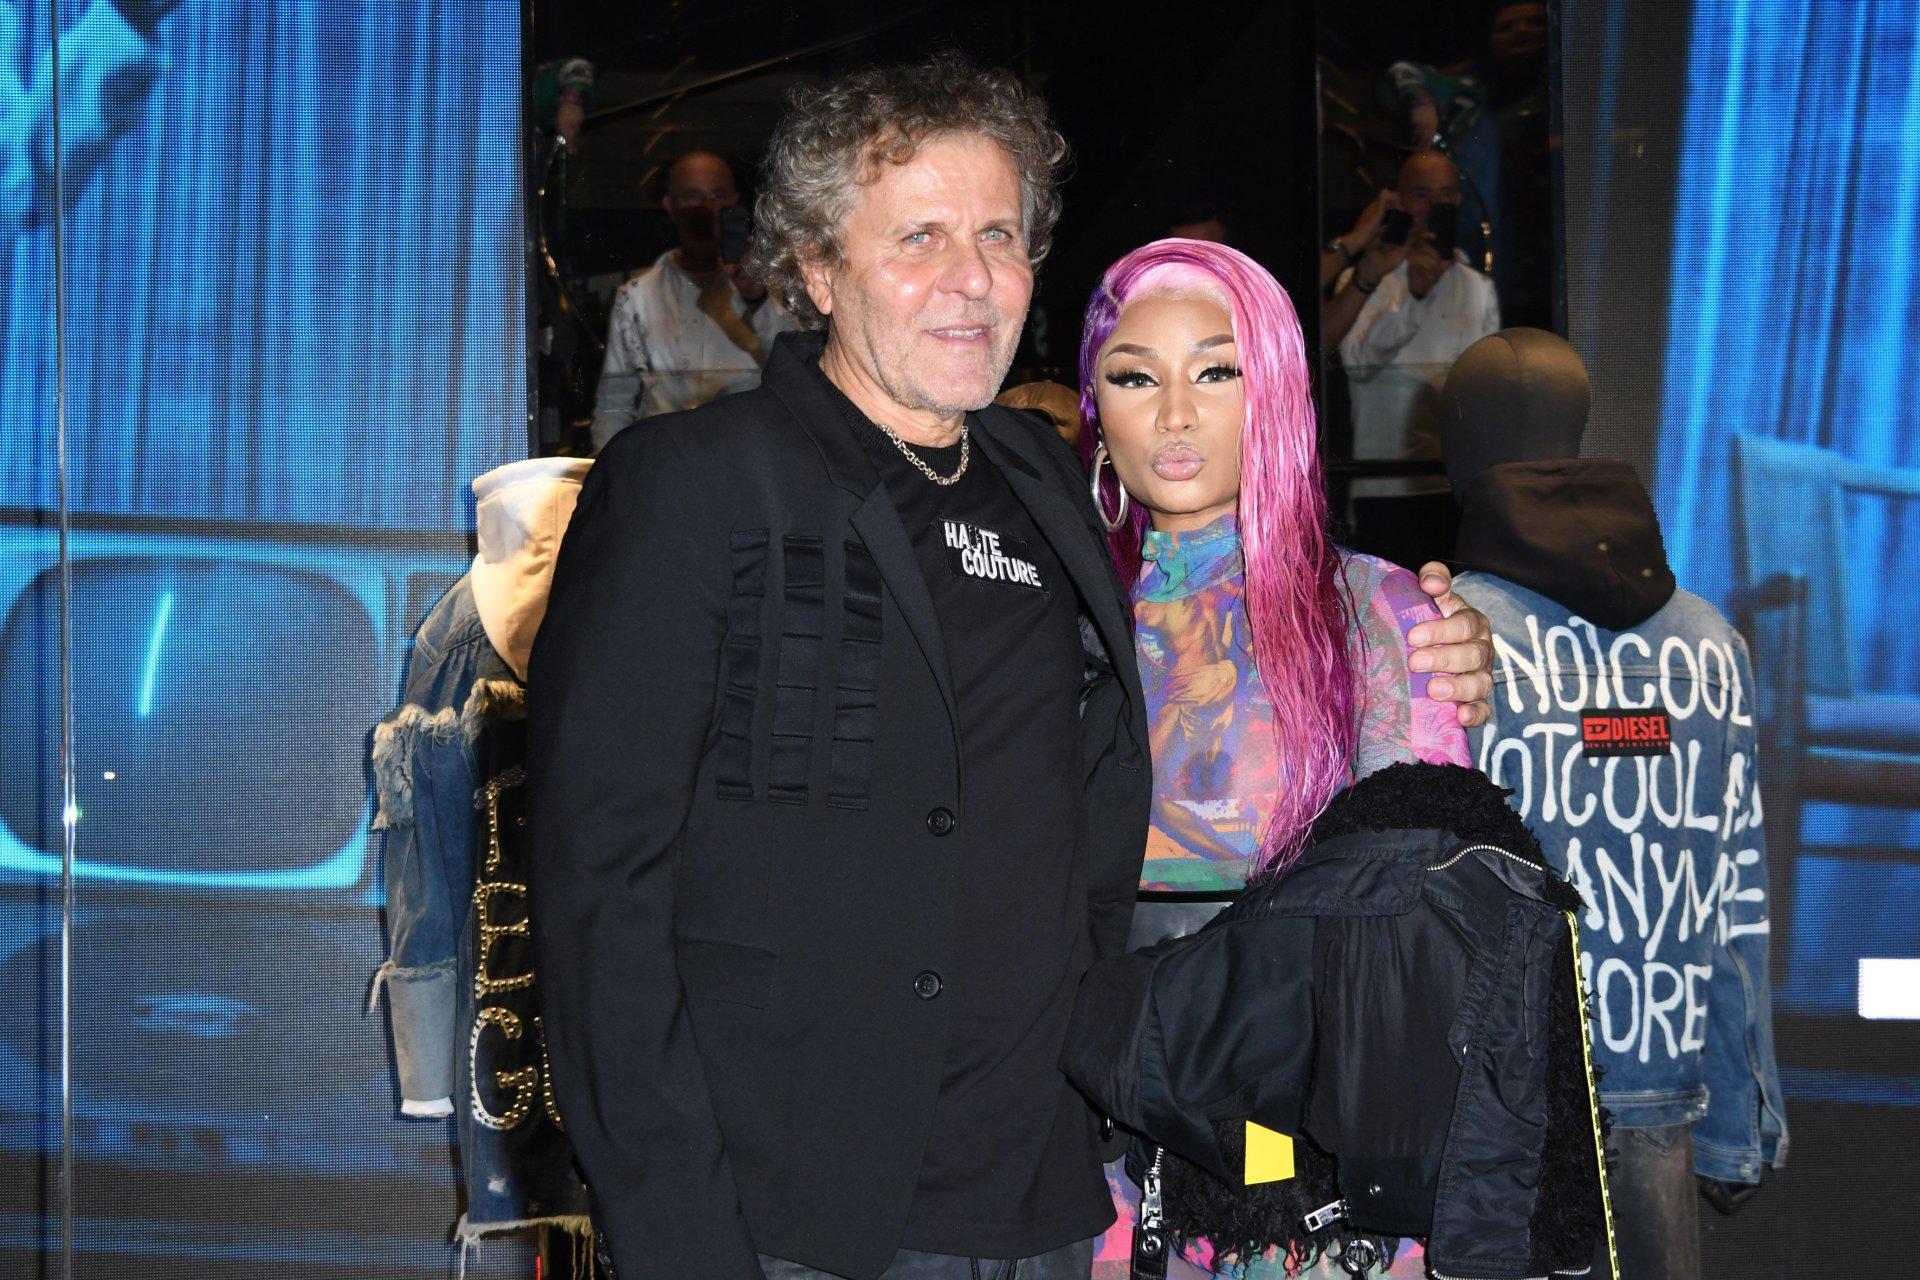 Nicki-Minaj-See-Through-TheFappeningBlog.com-41.jpg